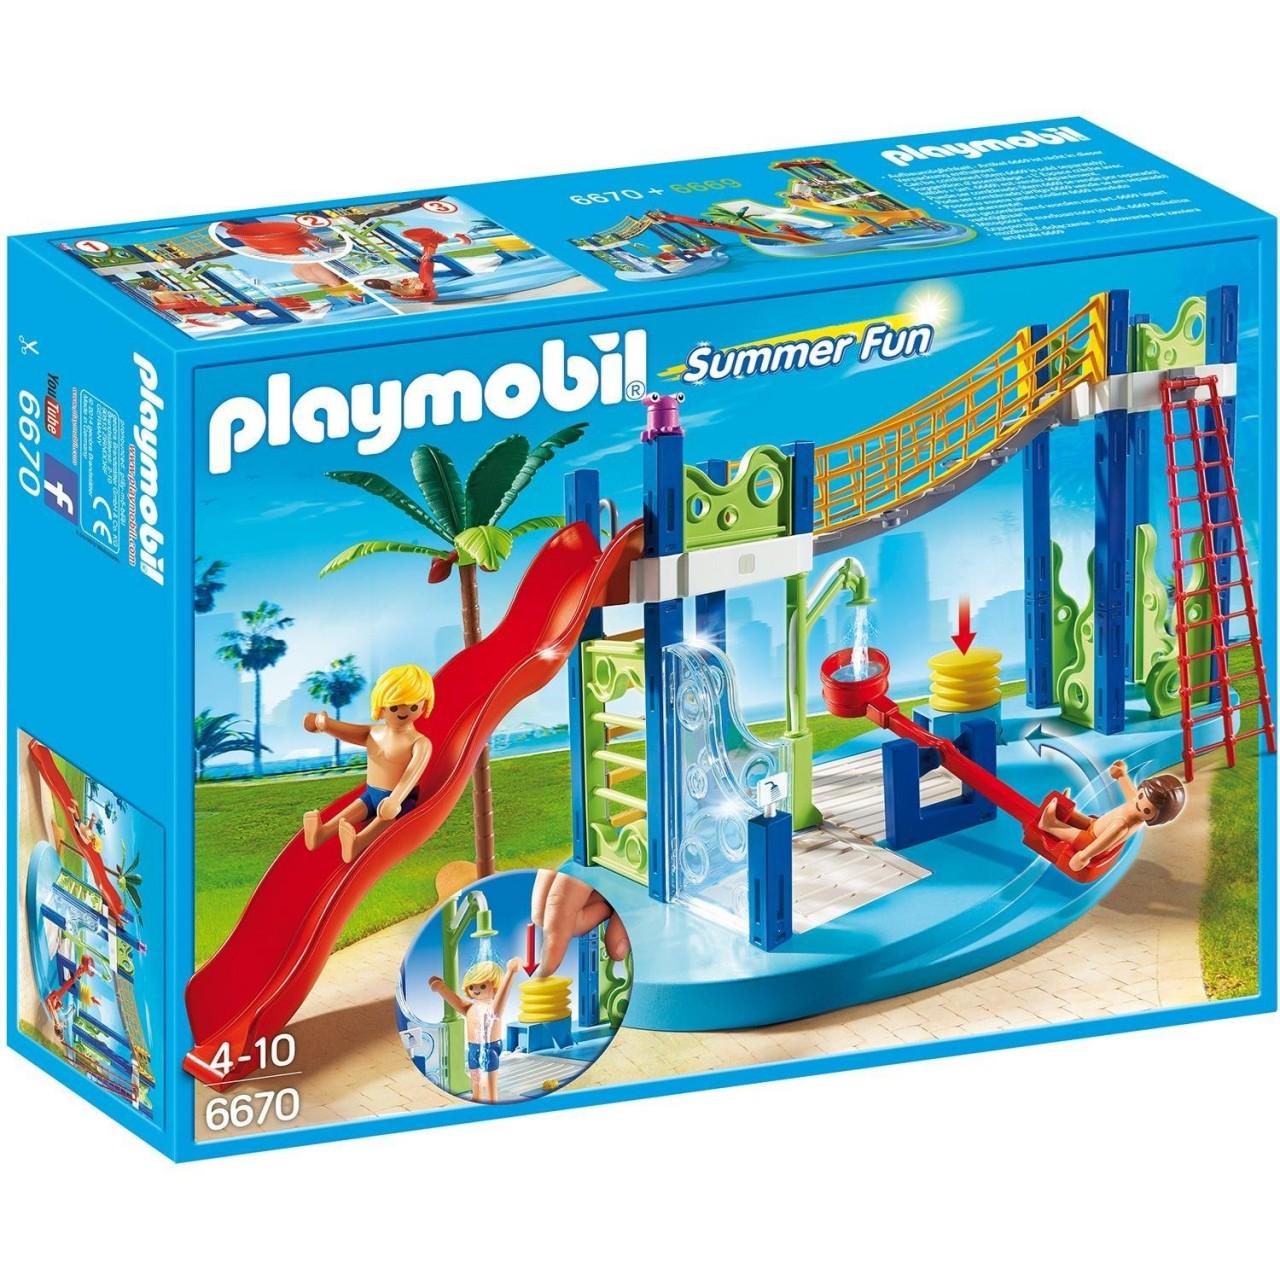 PLAYMOBIL 6670 Wasserspielplatz Spielpark Wellenrutsche Neu & OVP